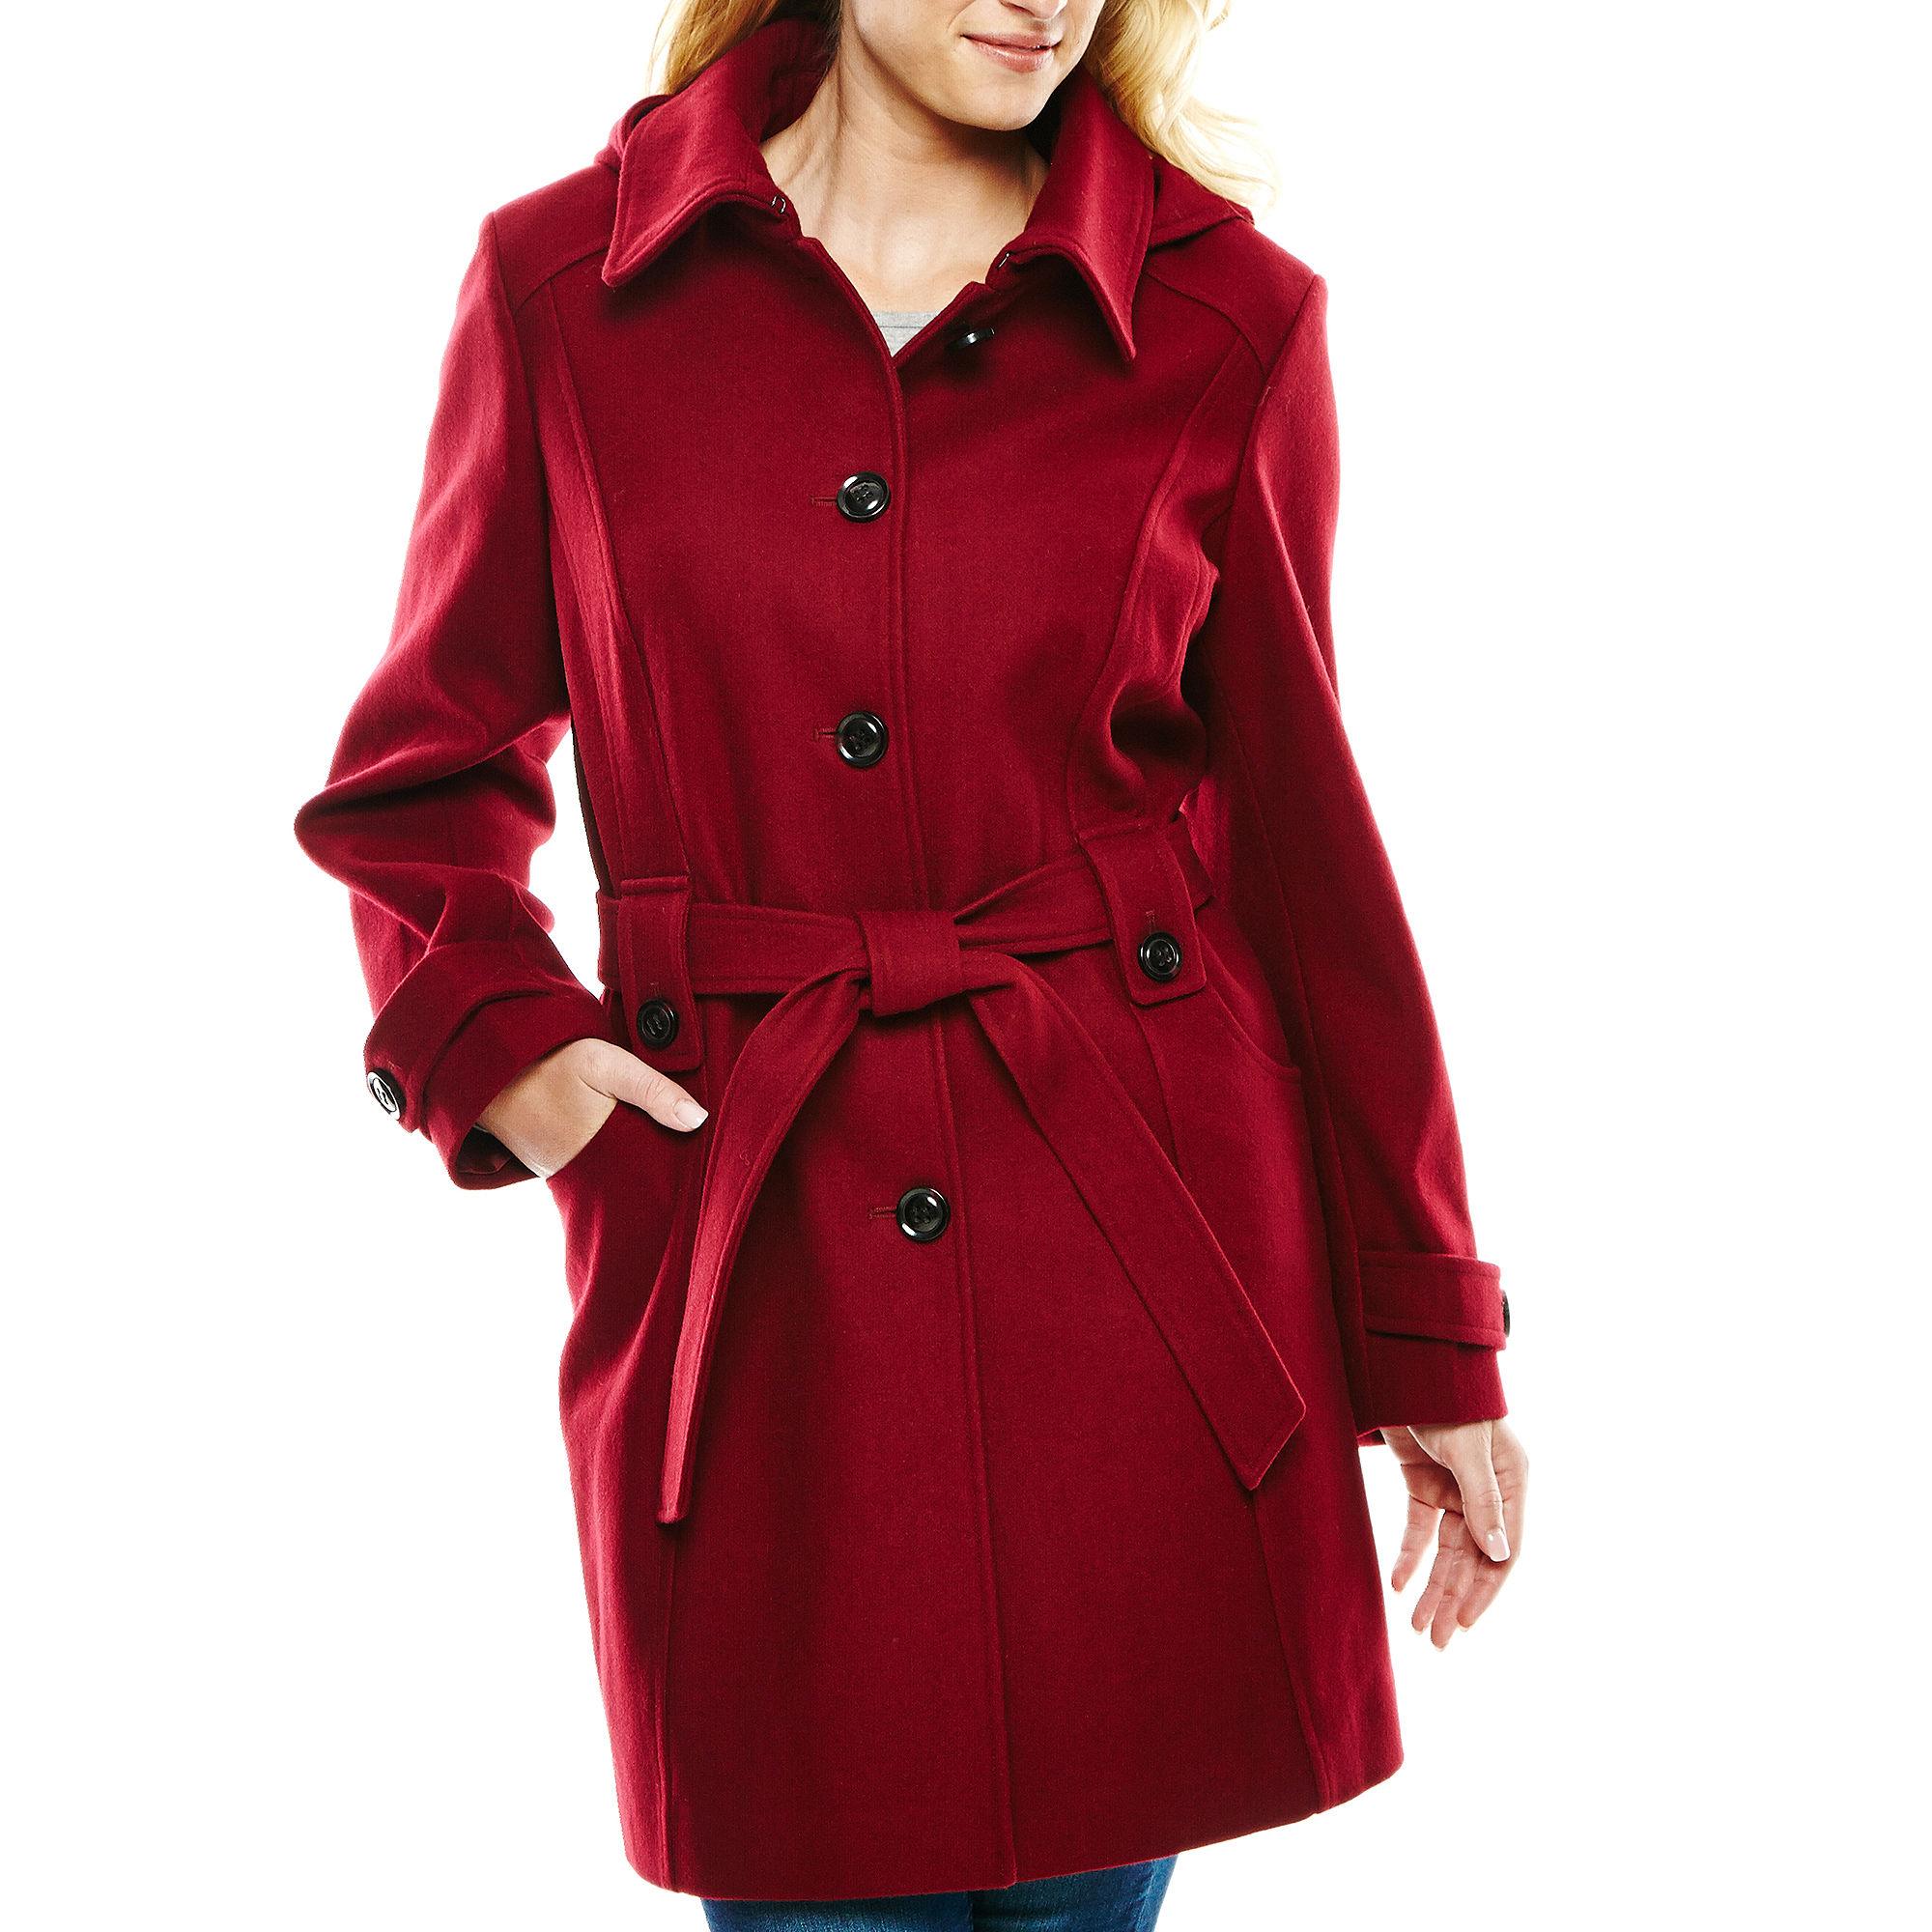 Liz Claiborne Single-Breasted Belted Wool-Blend Jacket - Plus